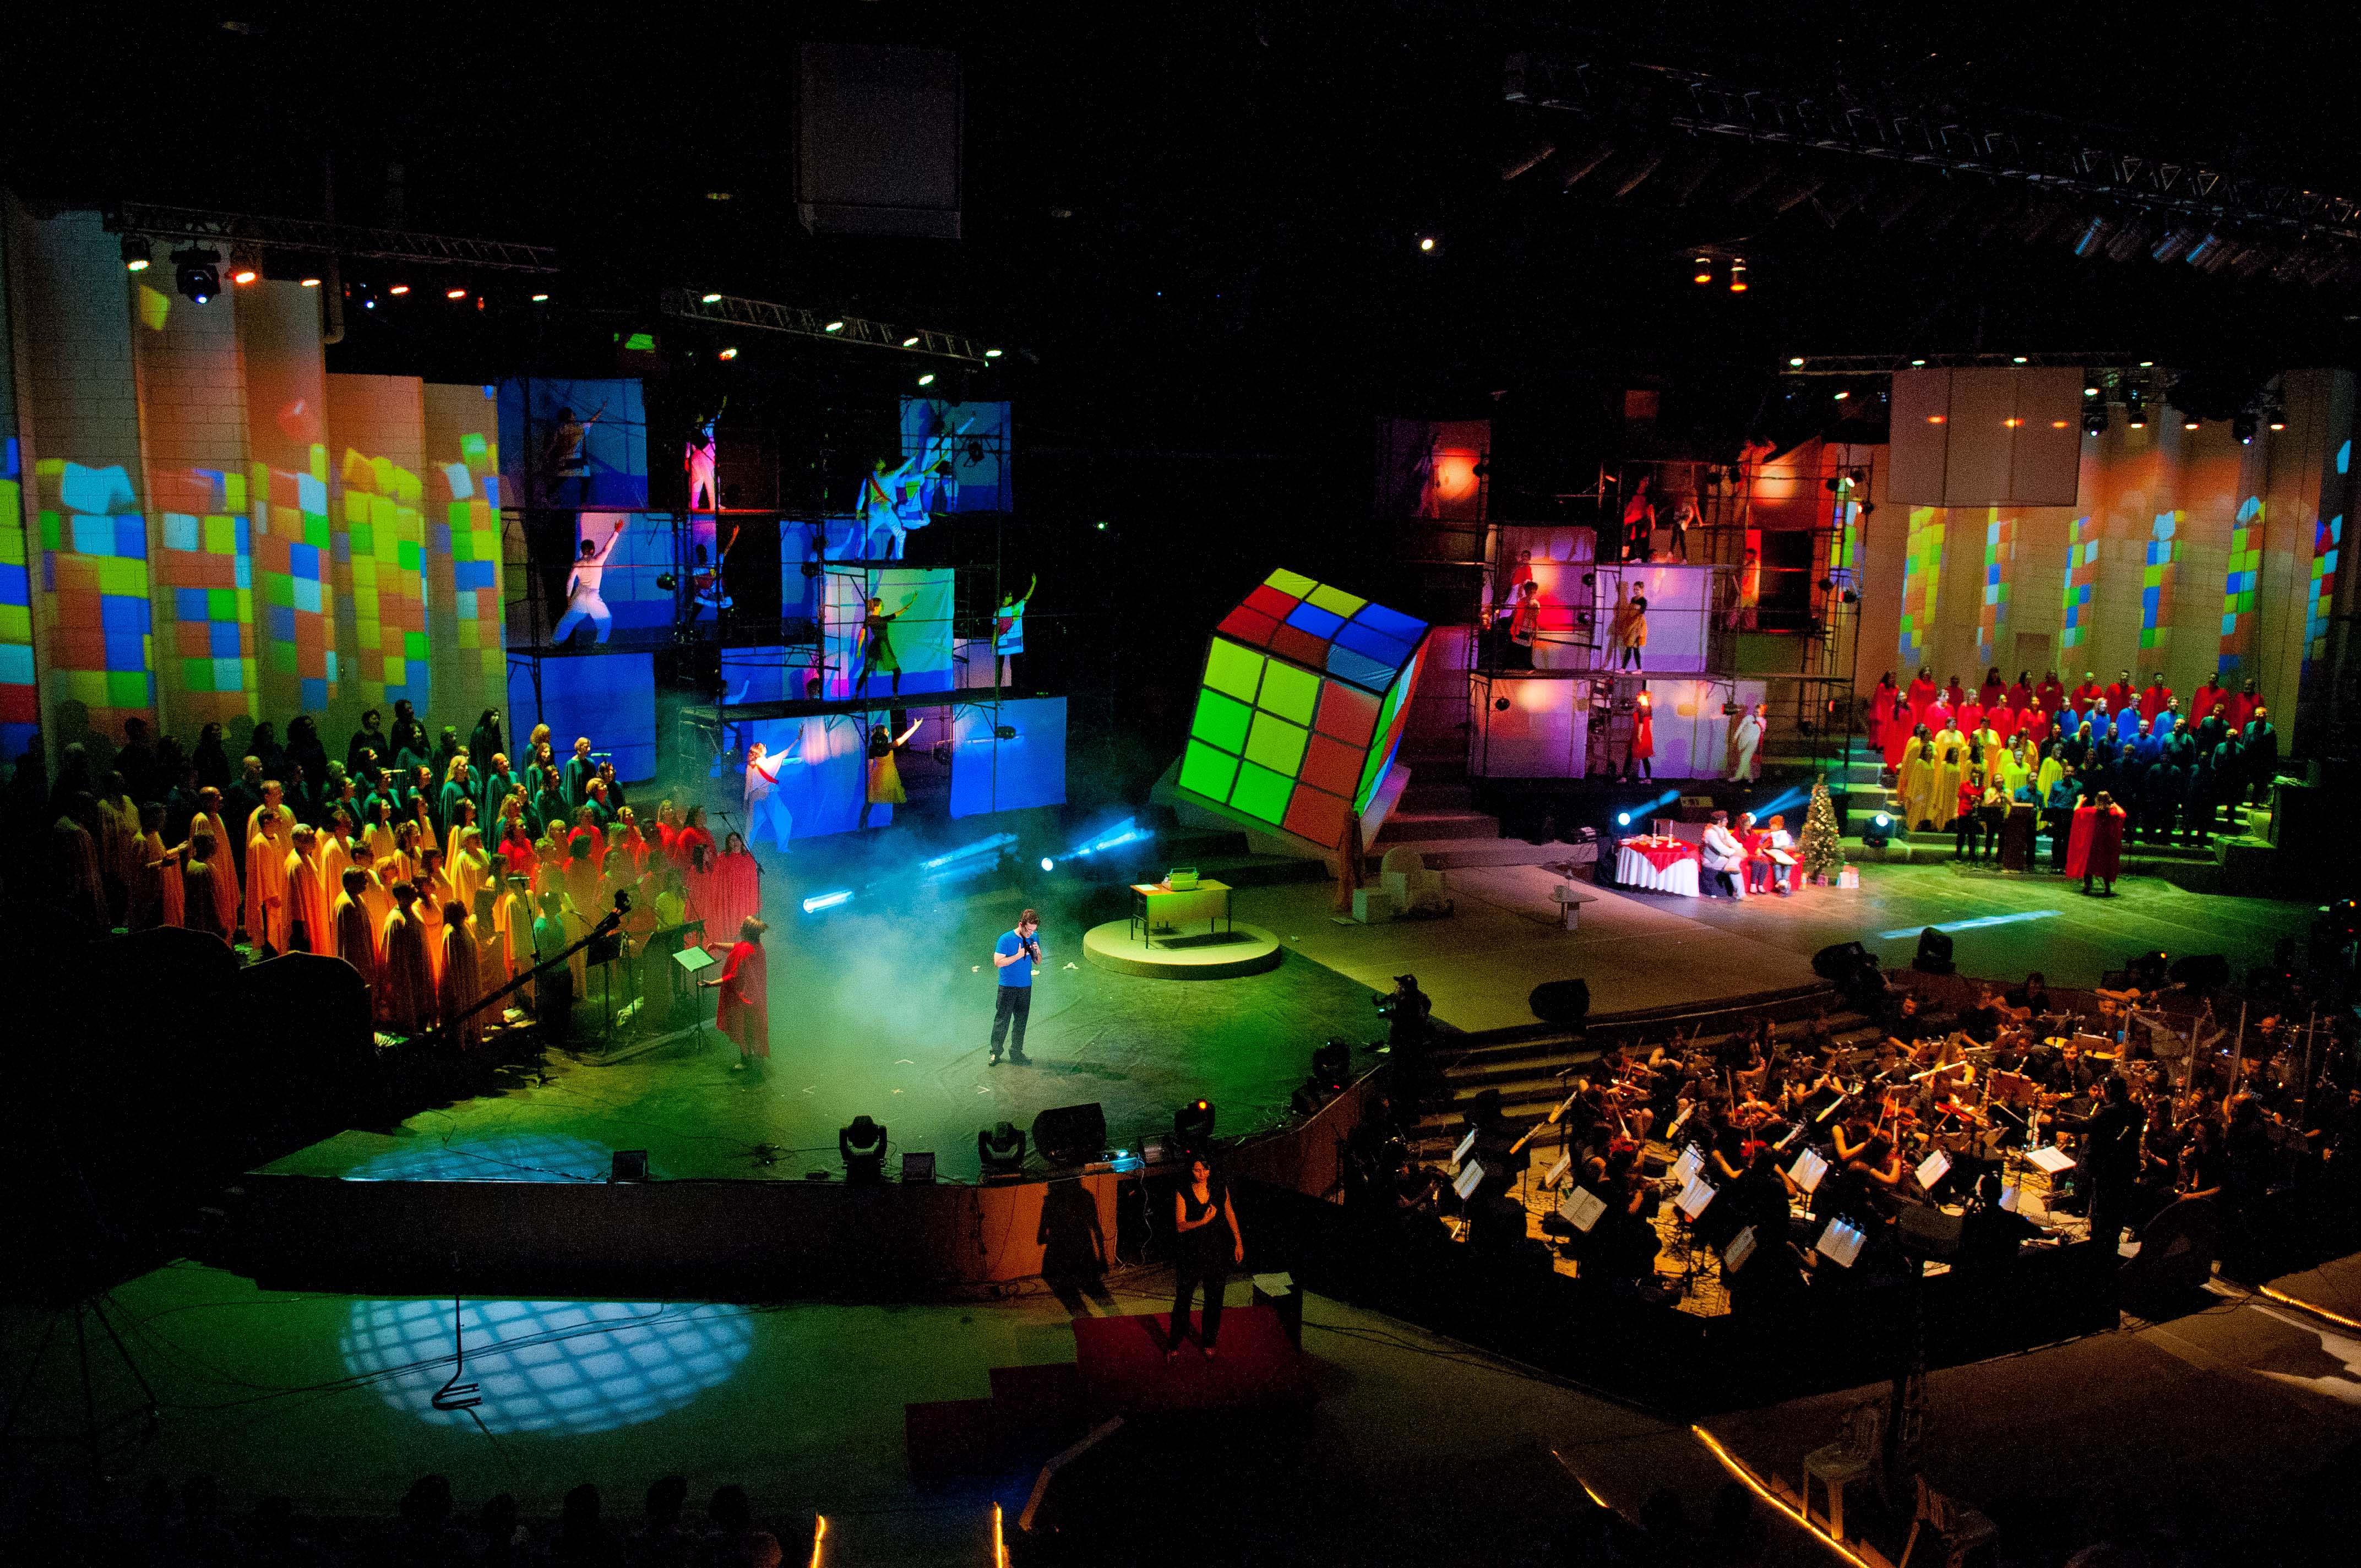 Igreja Batista de Curitiba recebe mega apresentação de Natal